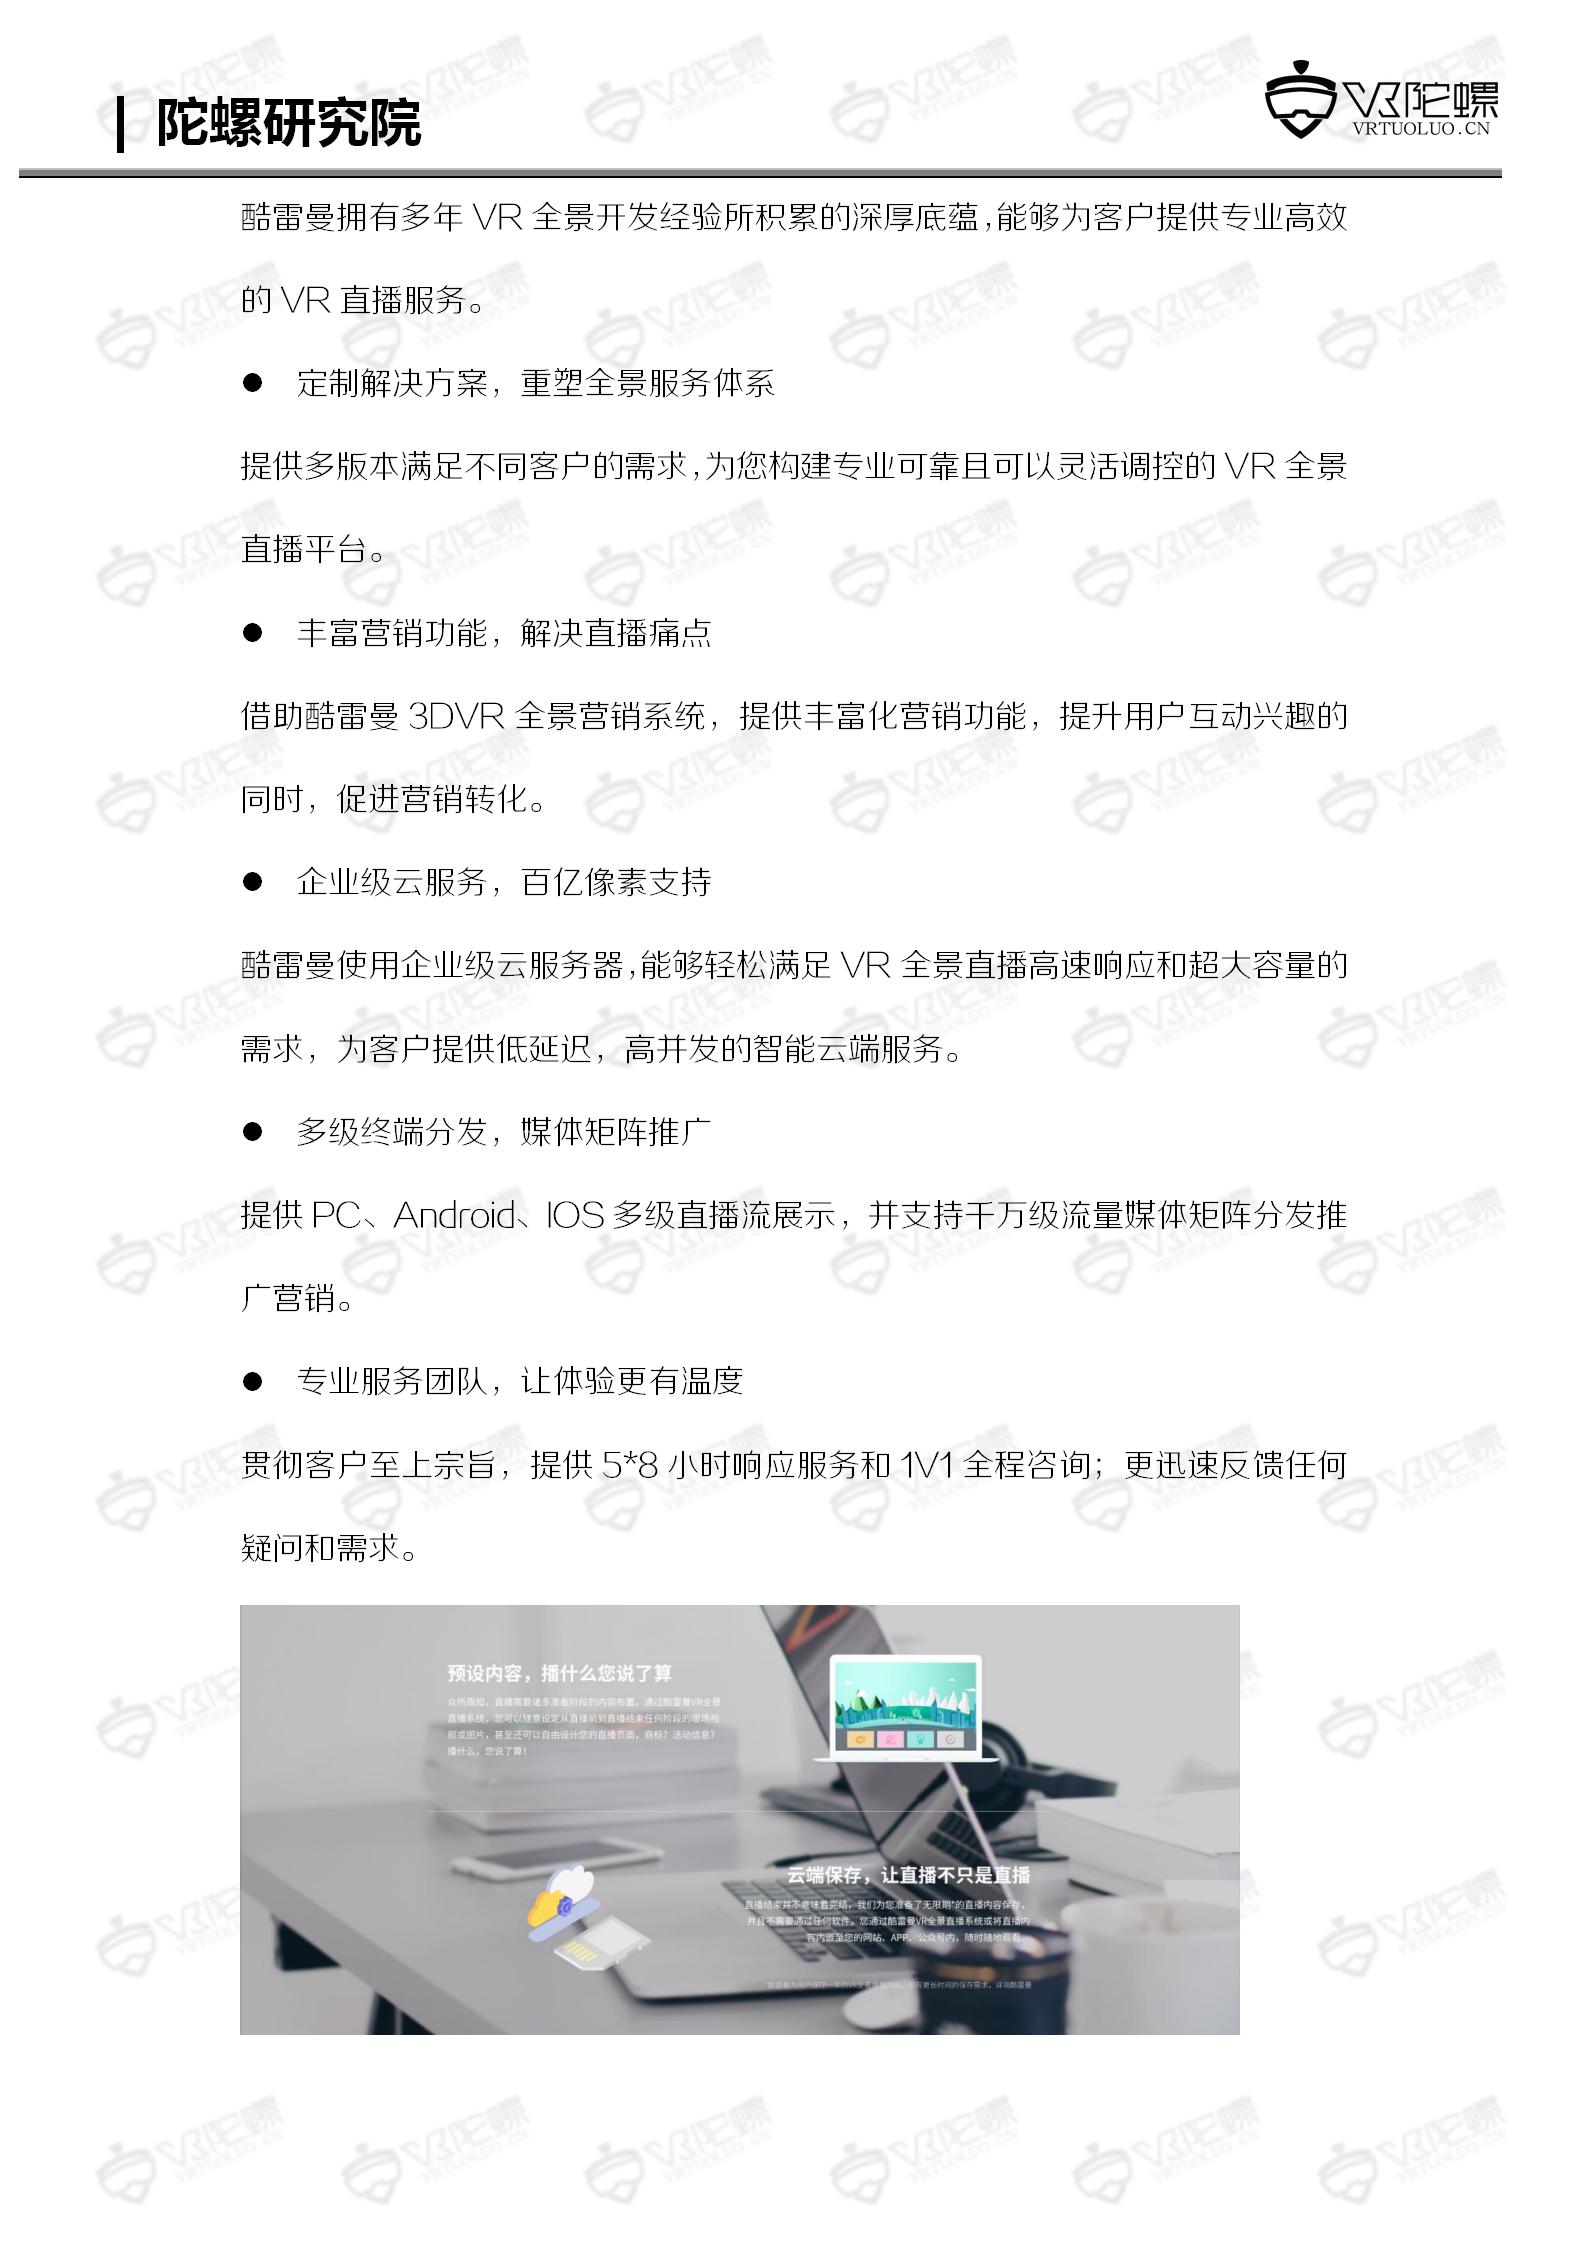 XR行业应用,VR直播